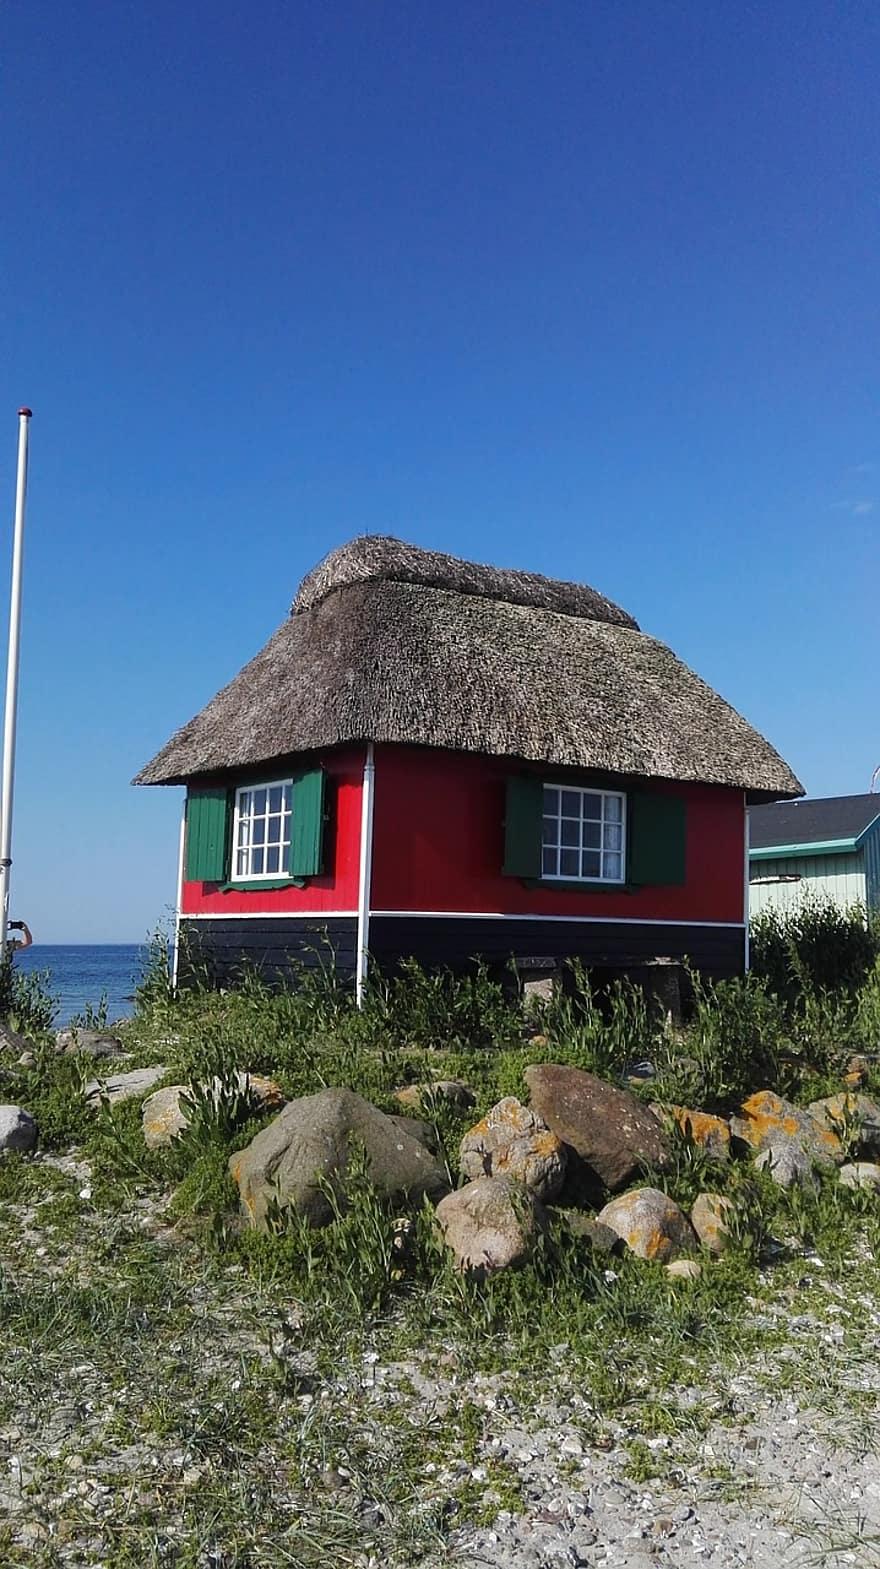 hut beach summer blue sand travel sky holiday house